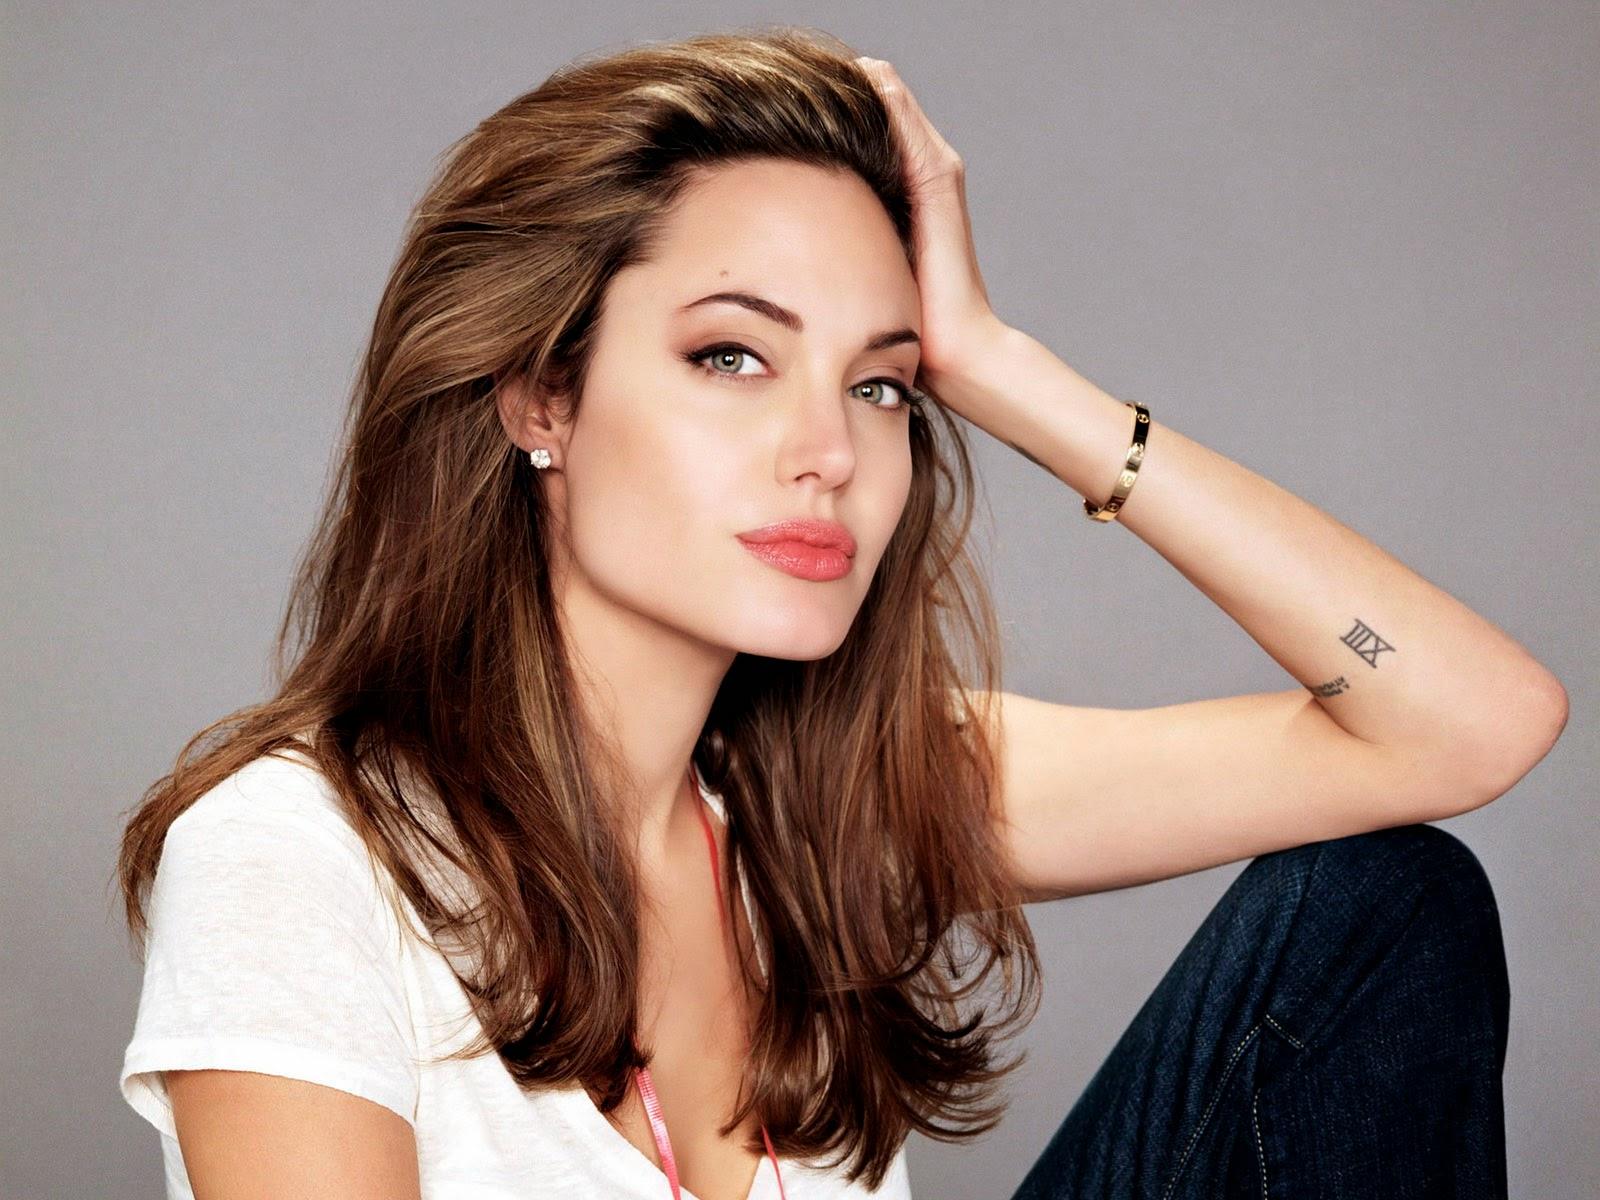 Fashion Blog: Anjelina Jolie Wallpapers